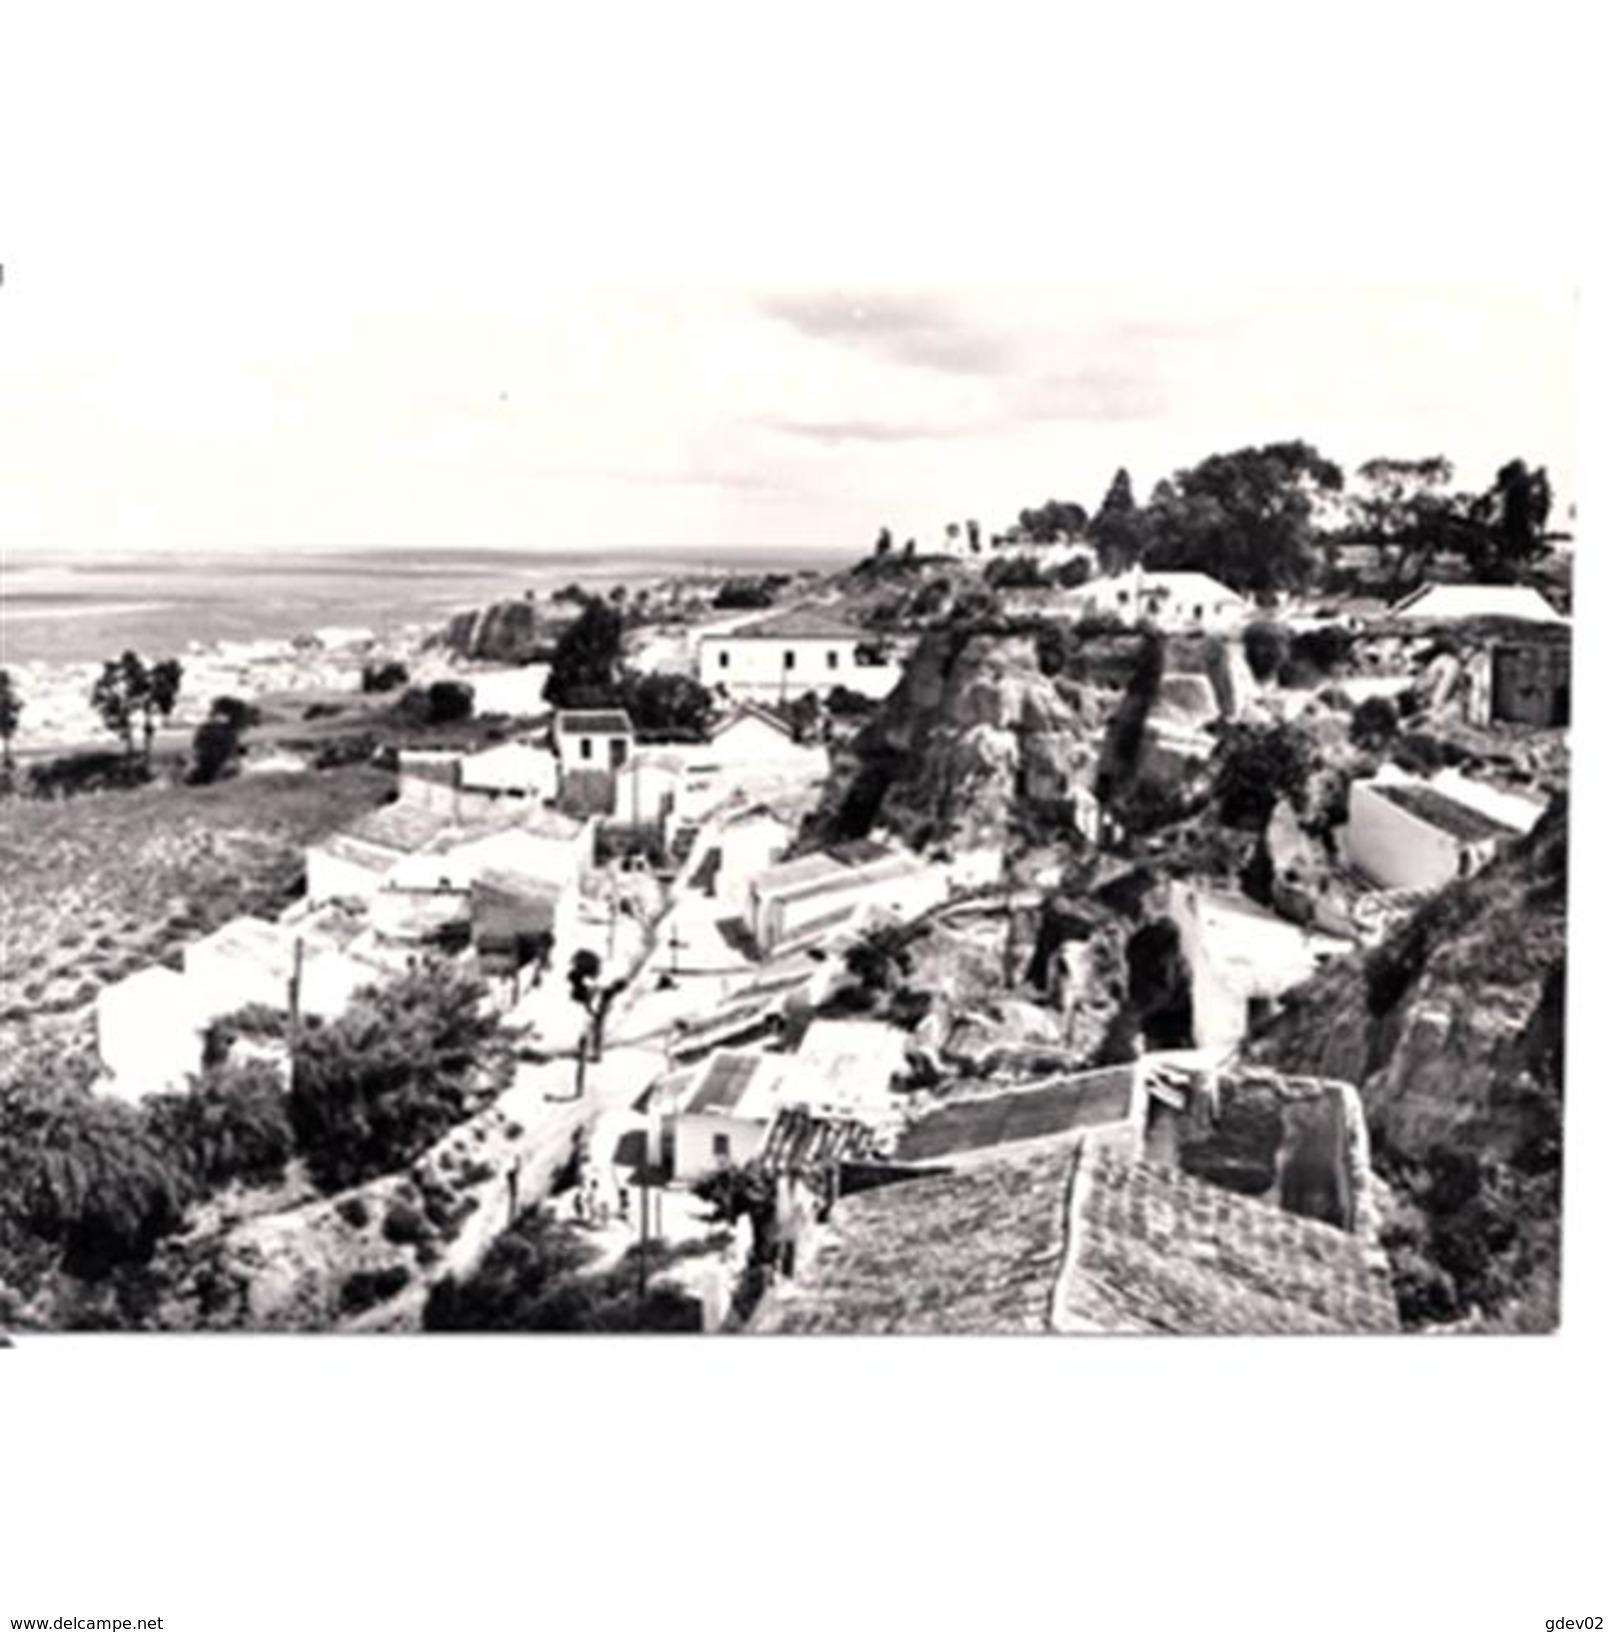 HLVTP7365-LFTD7123.Tarjeta Postal DE HUELVA.Casas,arboles,y CALLE CORRILLO ALTO  En HUELVA - Huelva